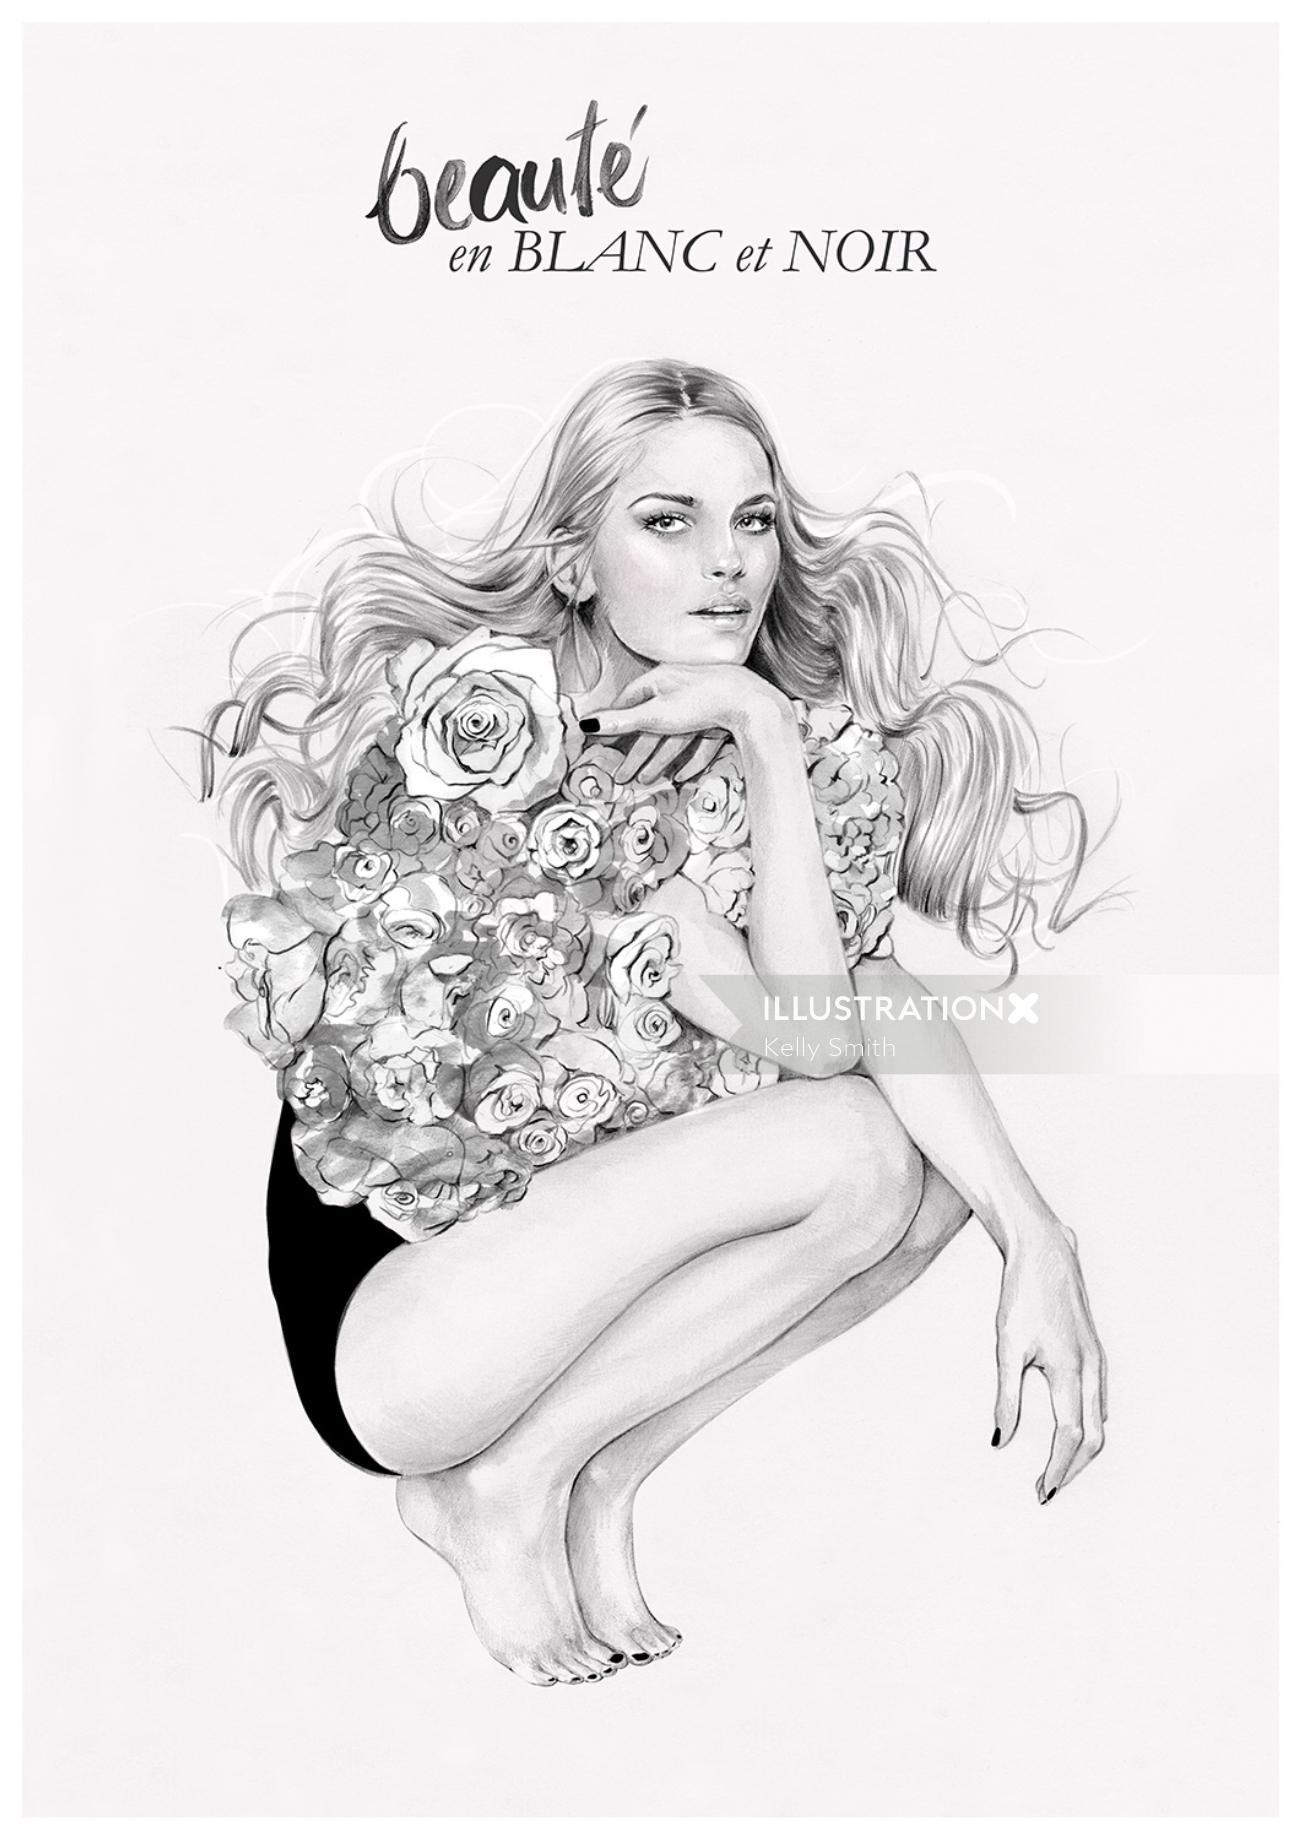 Woman fashion illustration by Kelly Smith